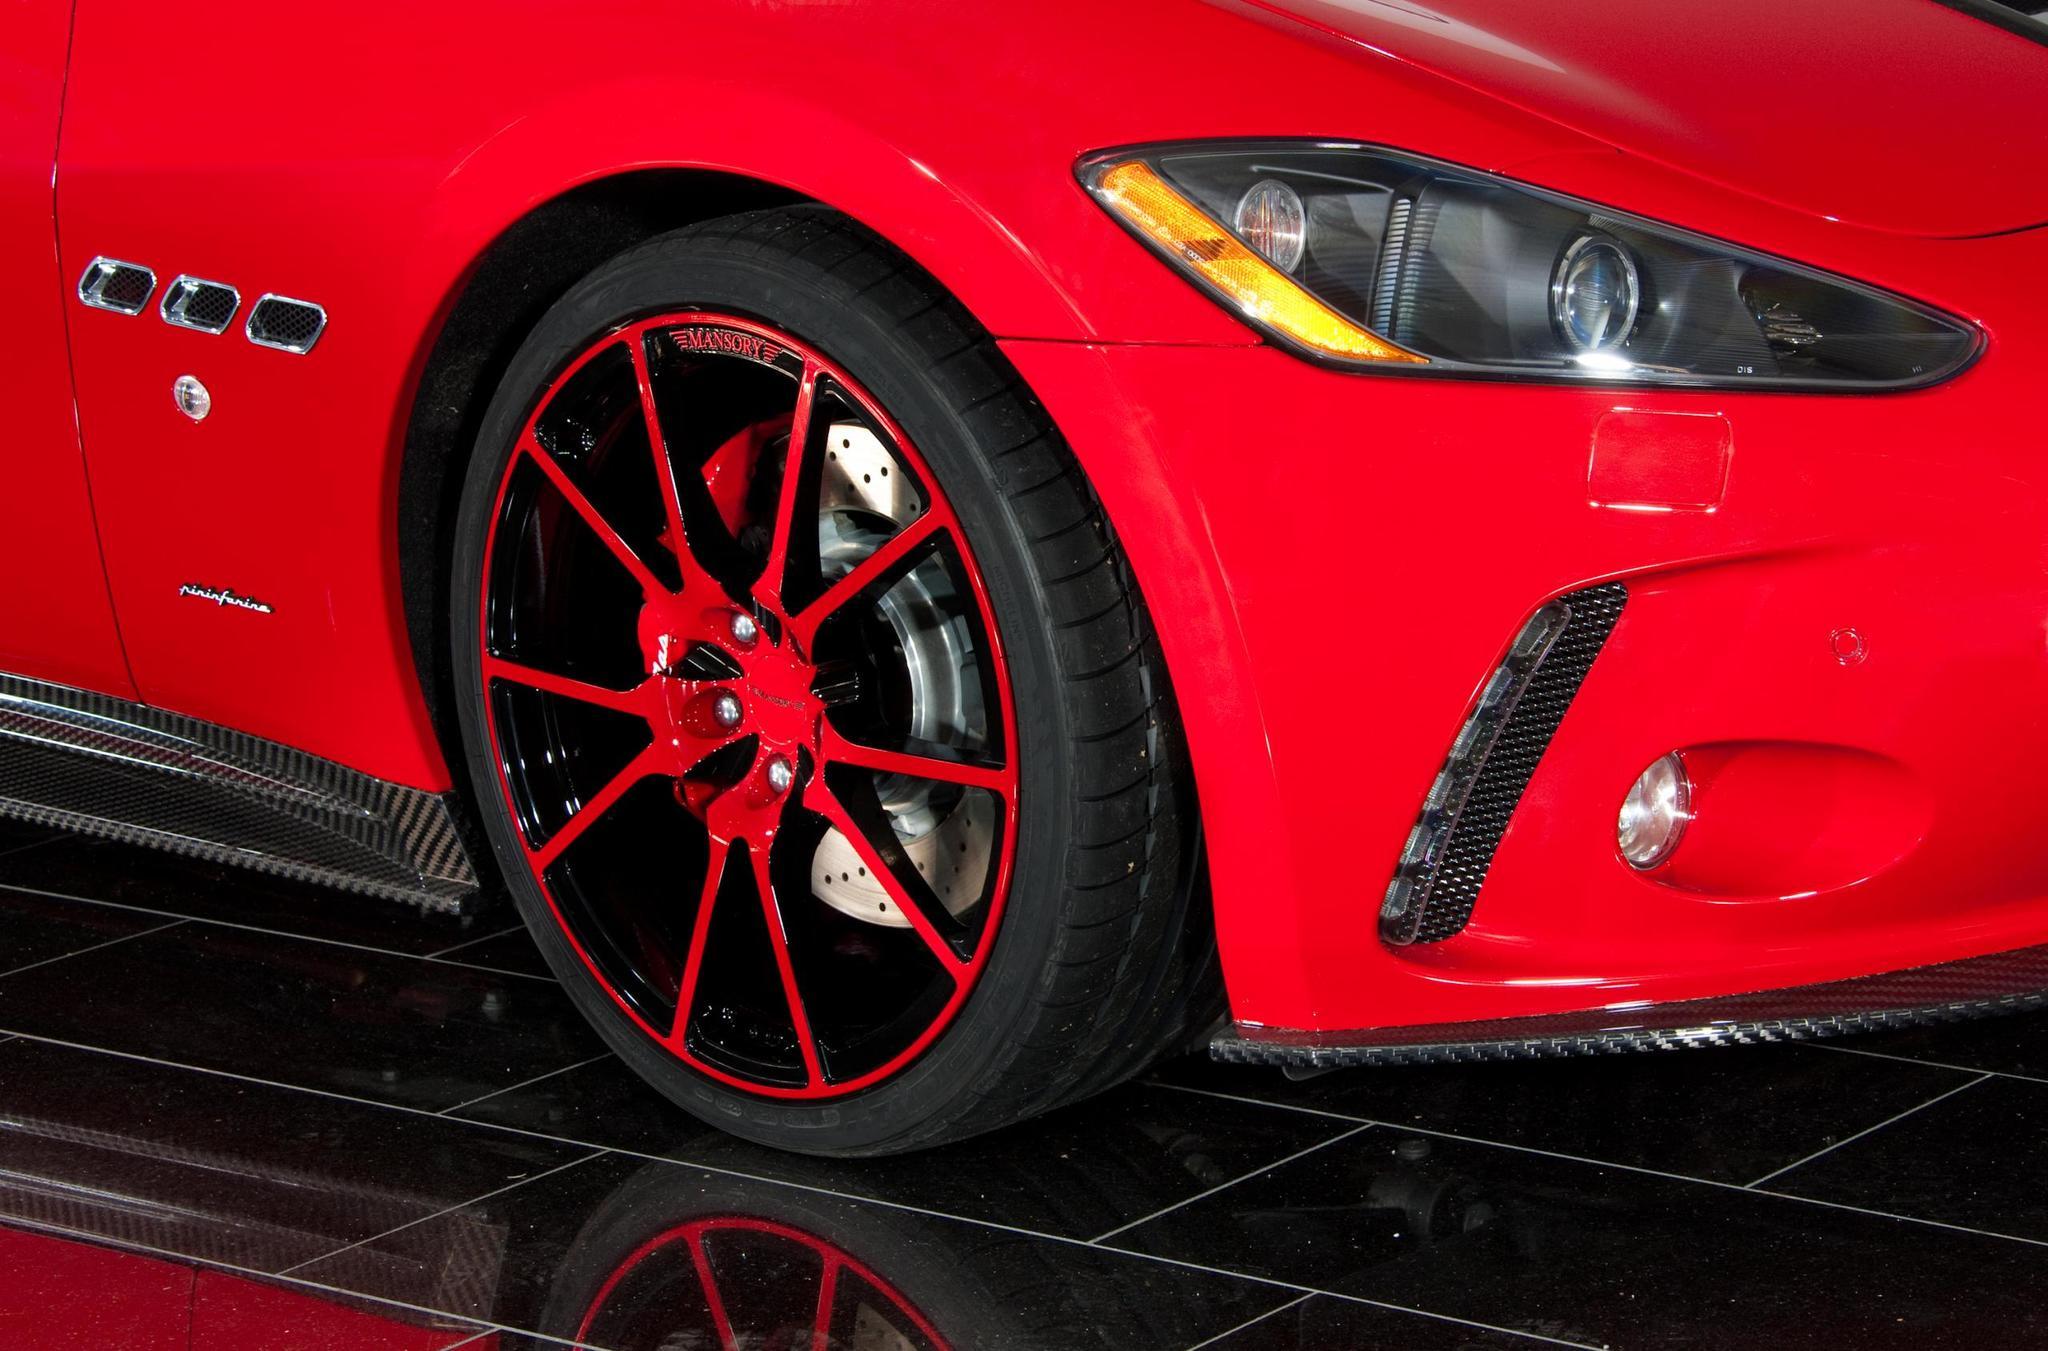 Mansory body kit for Maserati Gran Turismo carbon